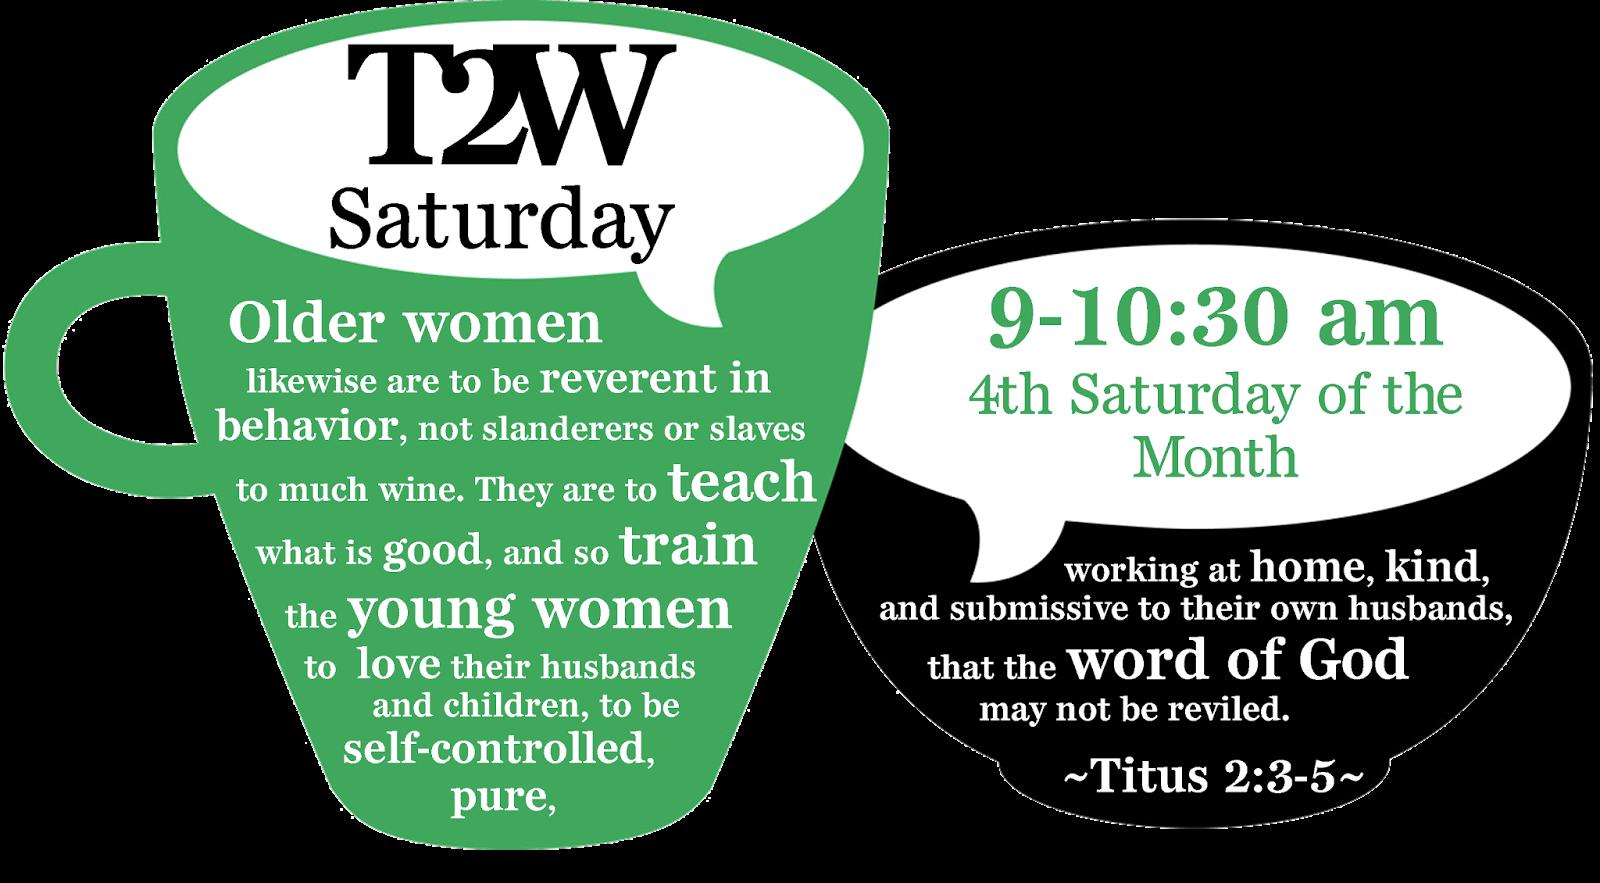 http://pbc-women.blogspot.com/2014/11/t2w-saturday-november-22.html